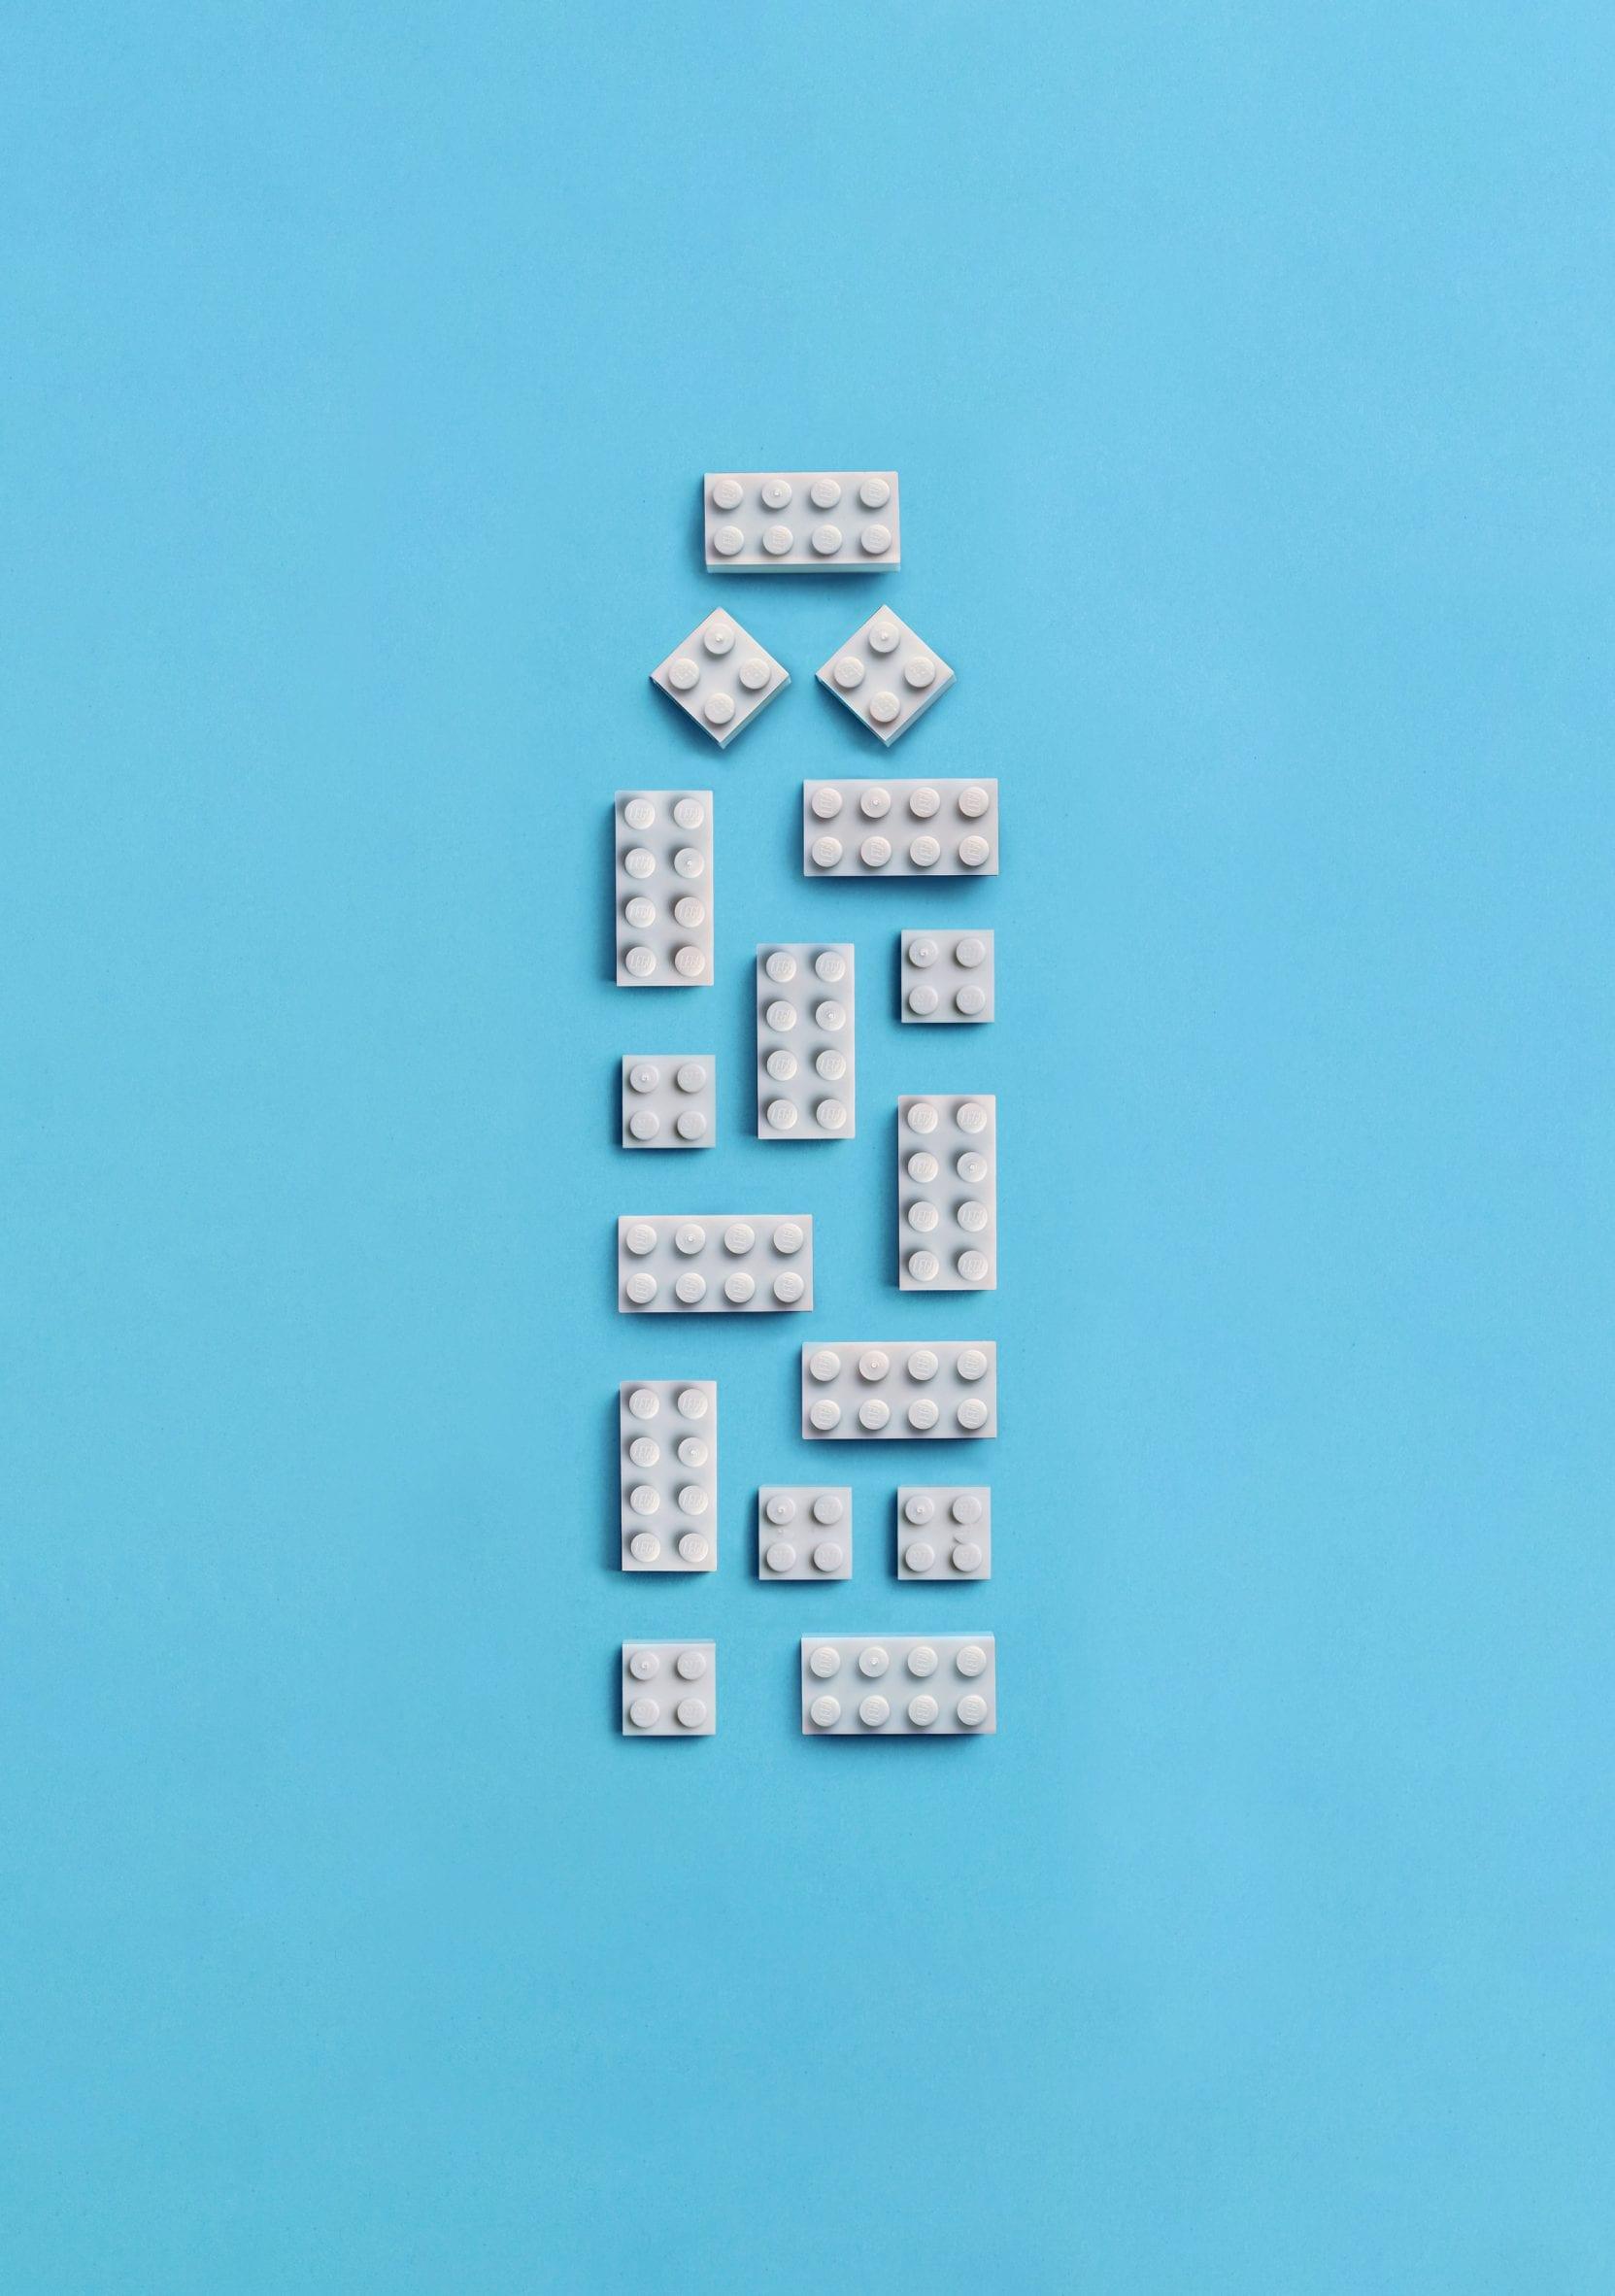 White lego bricks arranged in the shape of a bottle